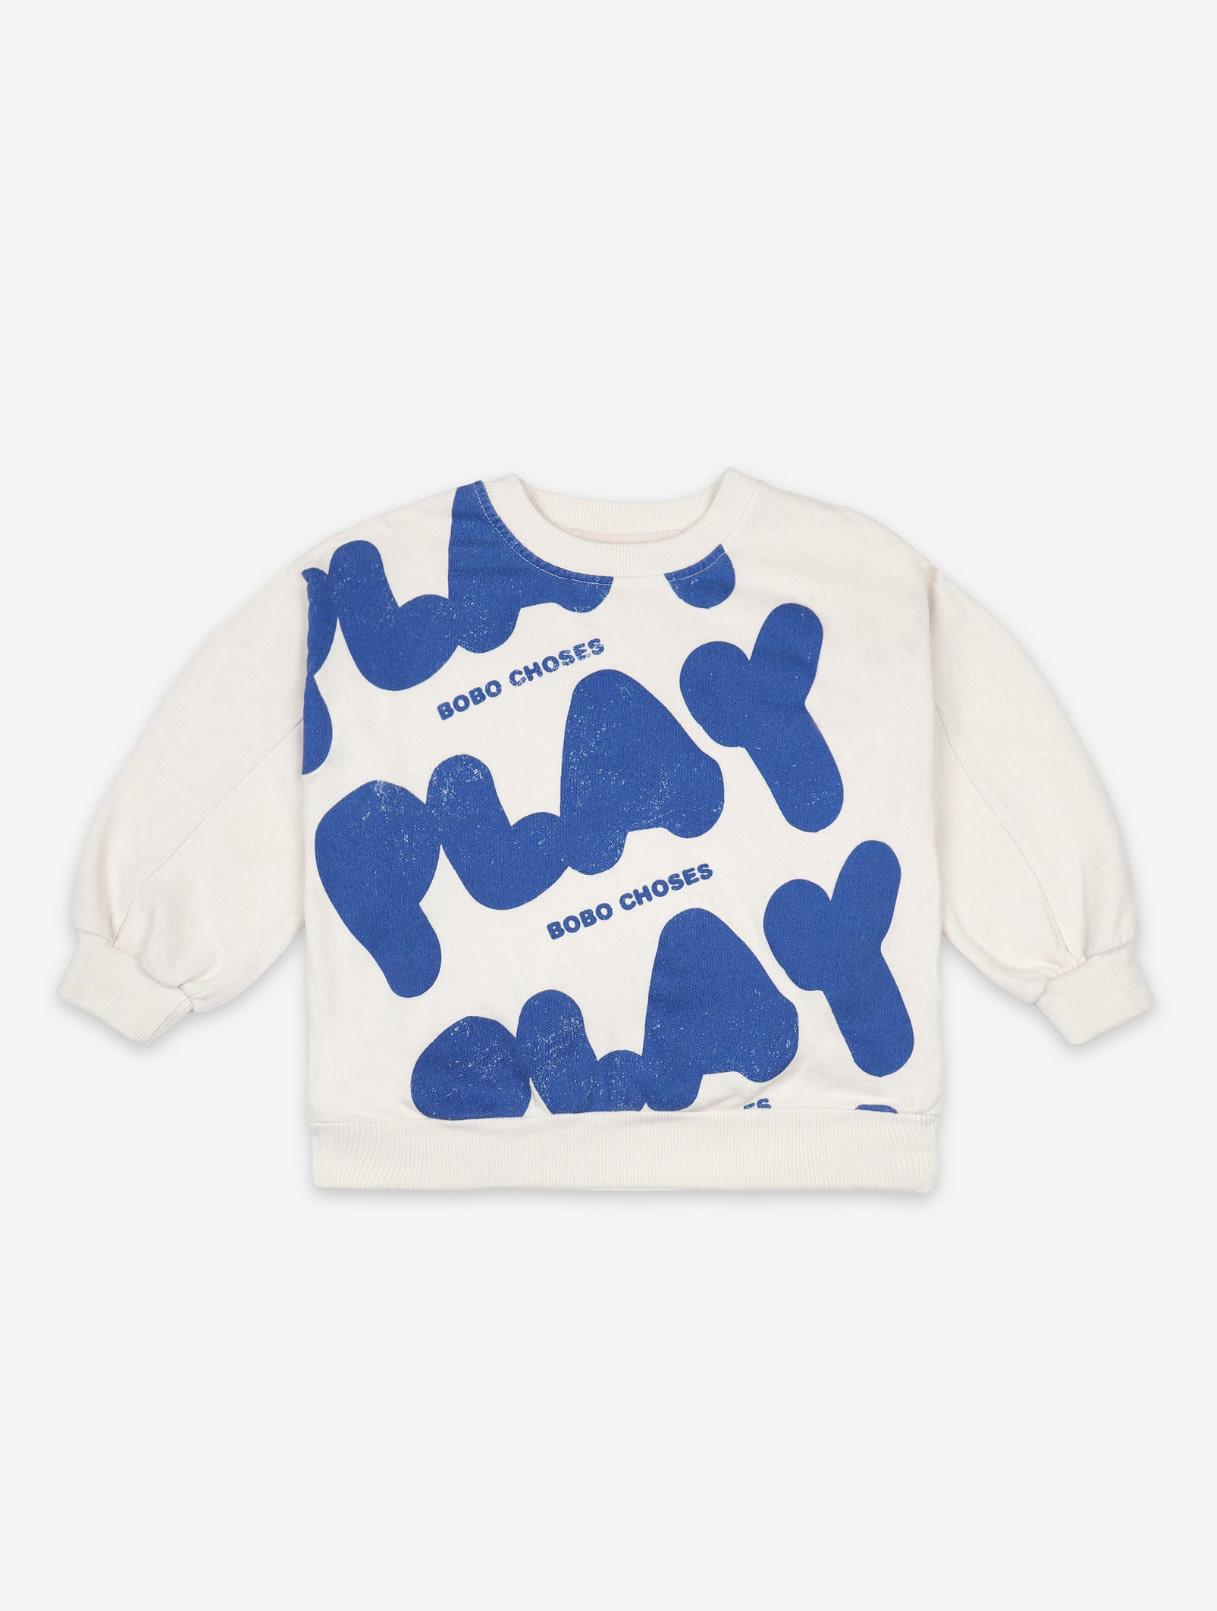 BOBO CHOSES Play All Over Sweatshirt